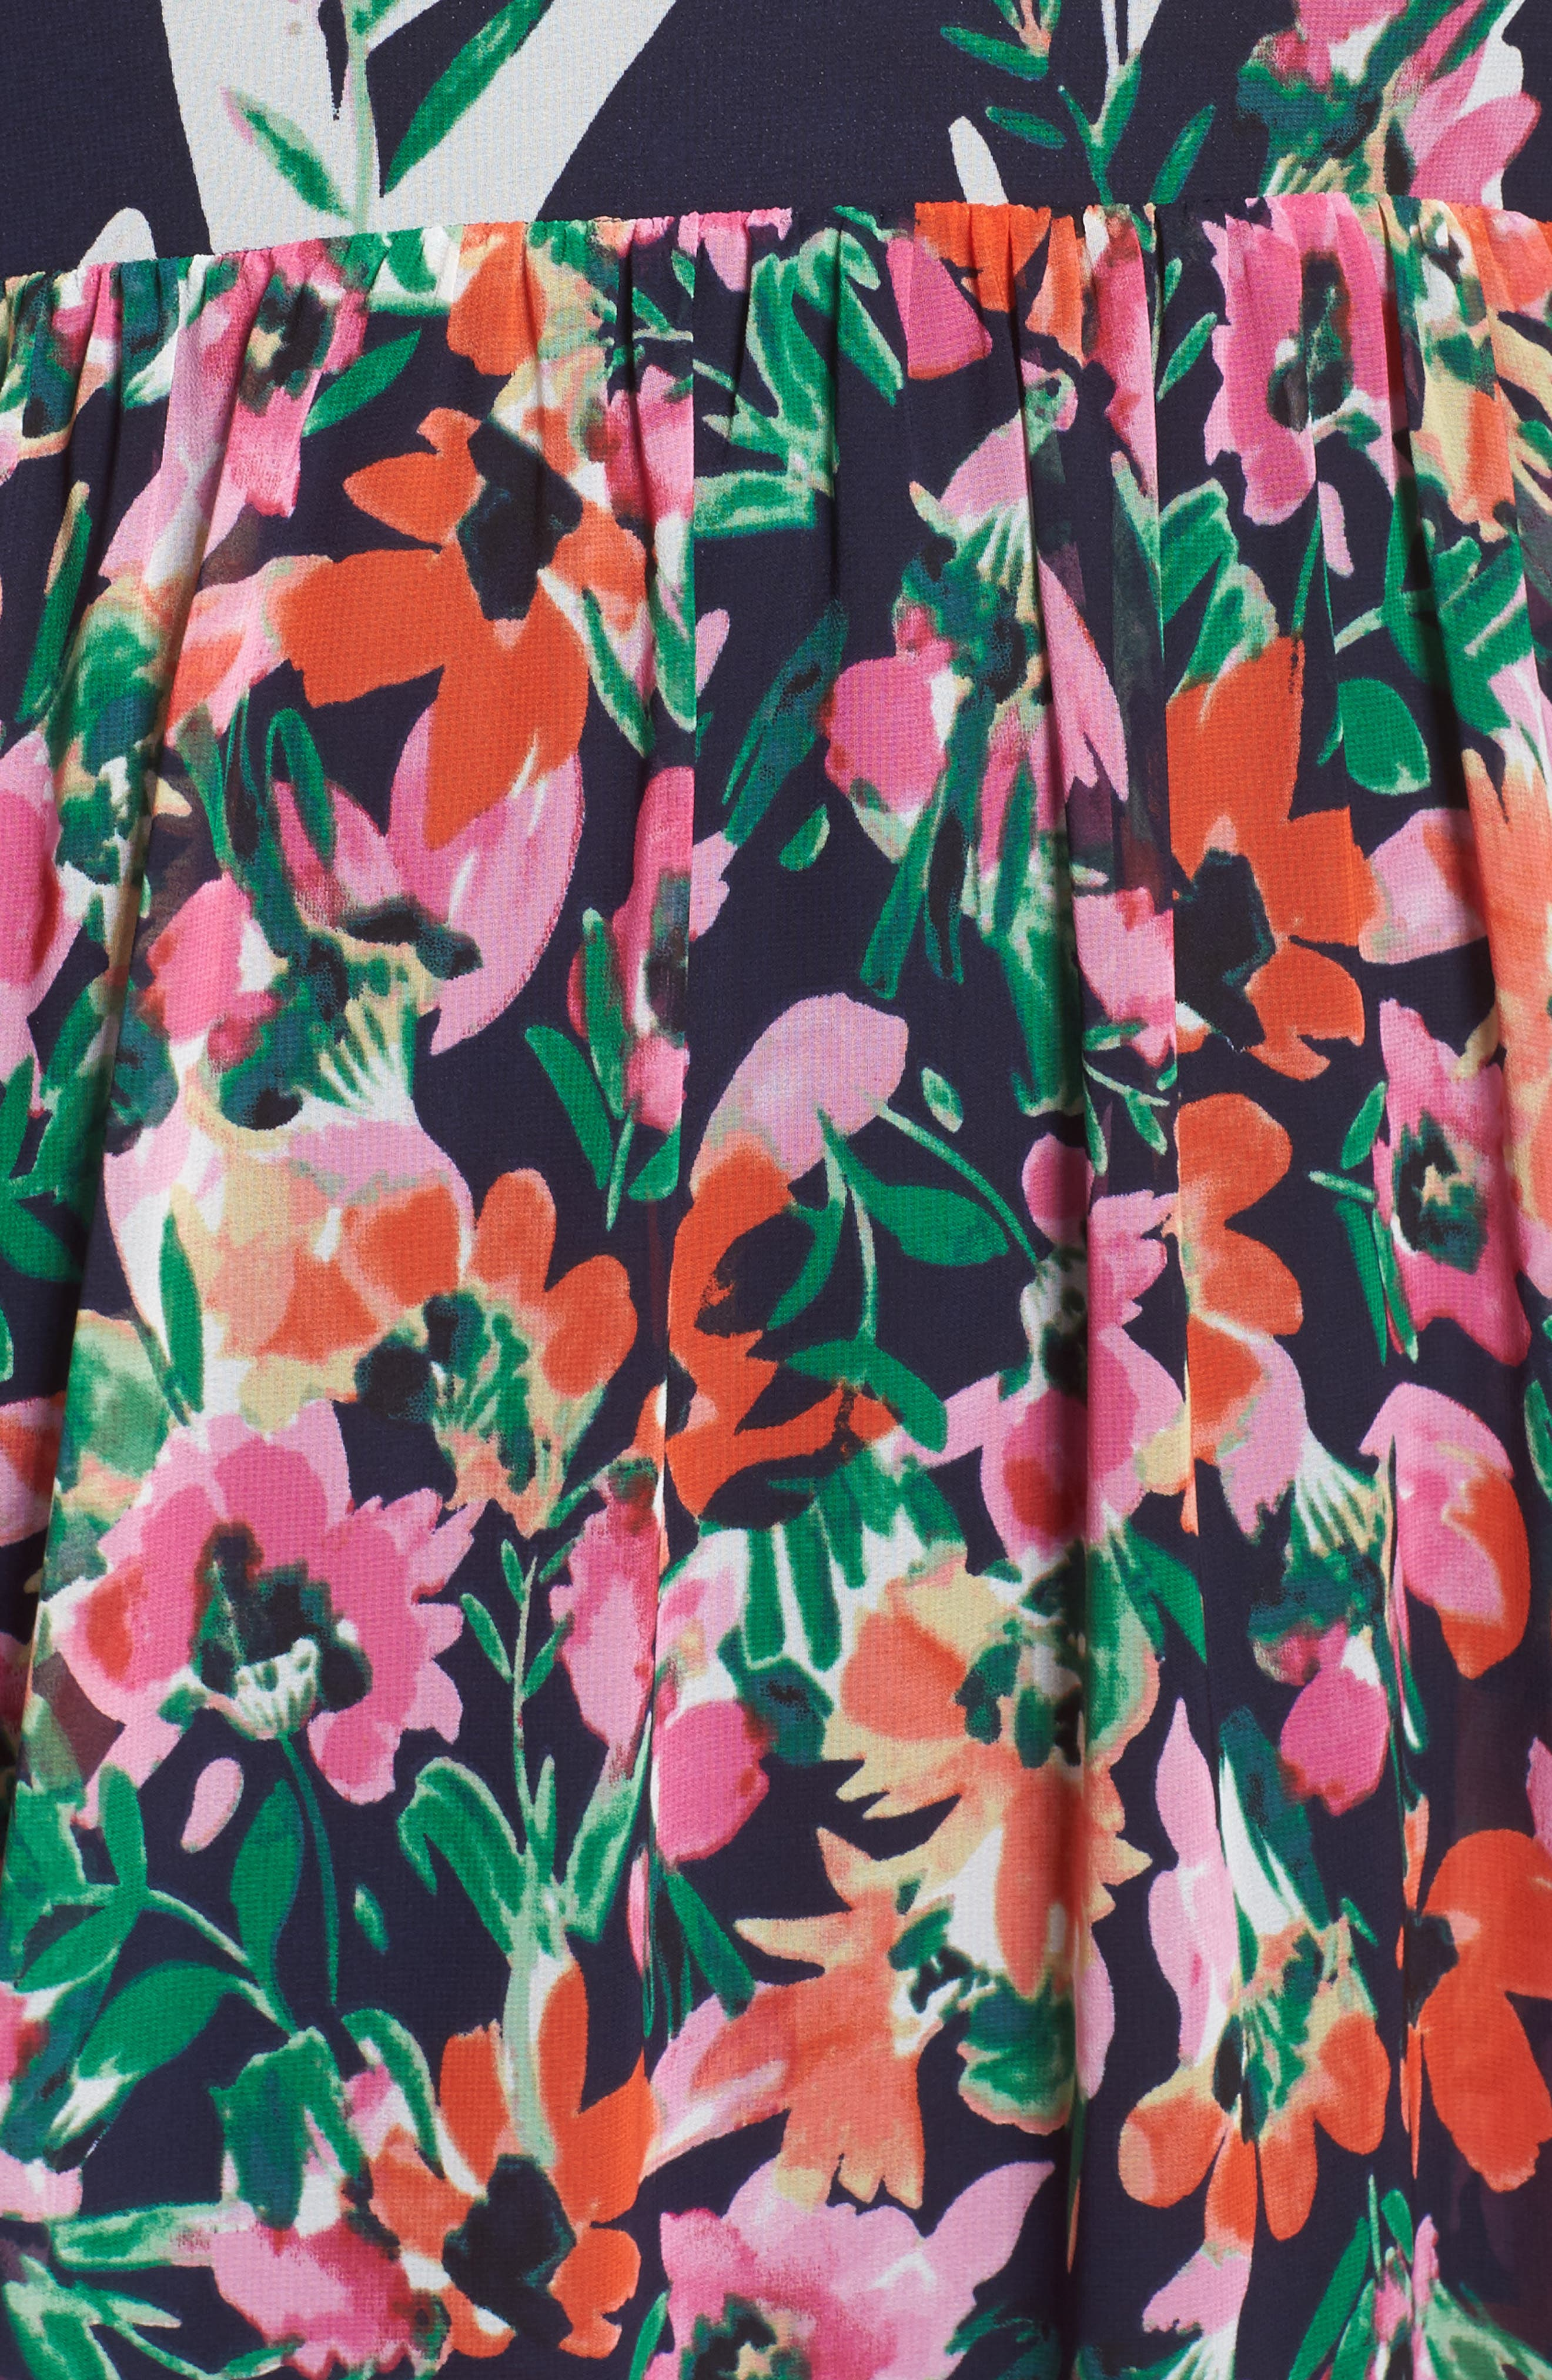 Floral Halter Chiffon Maxi Dress,                             Alternate thumbnail 5, color,                             Navy/ Pink